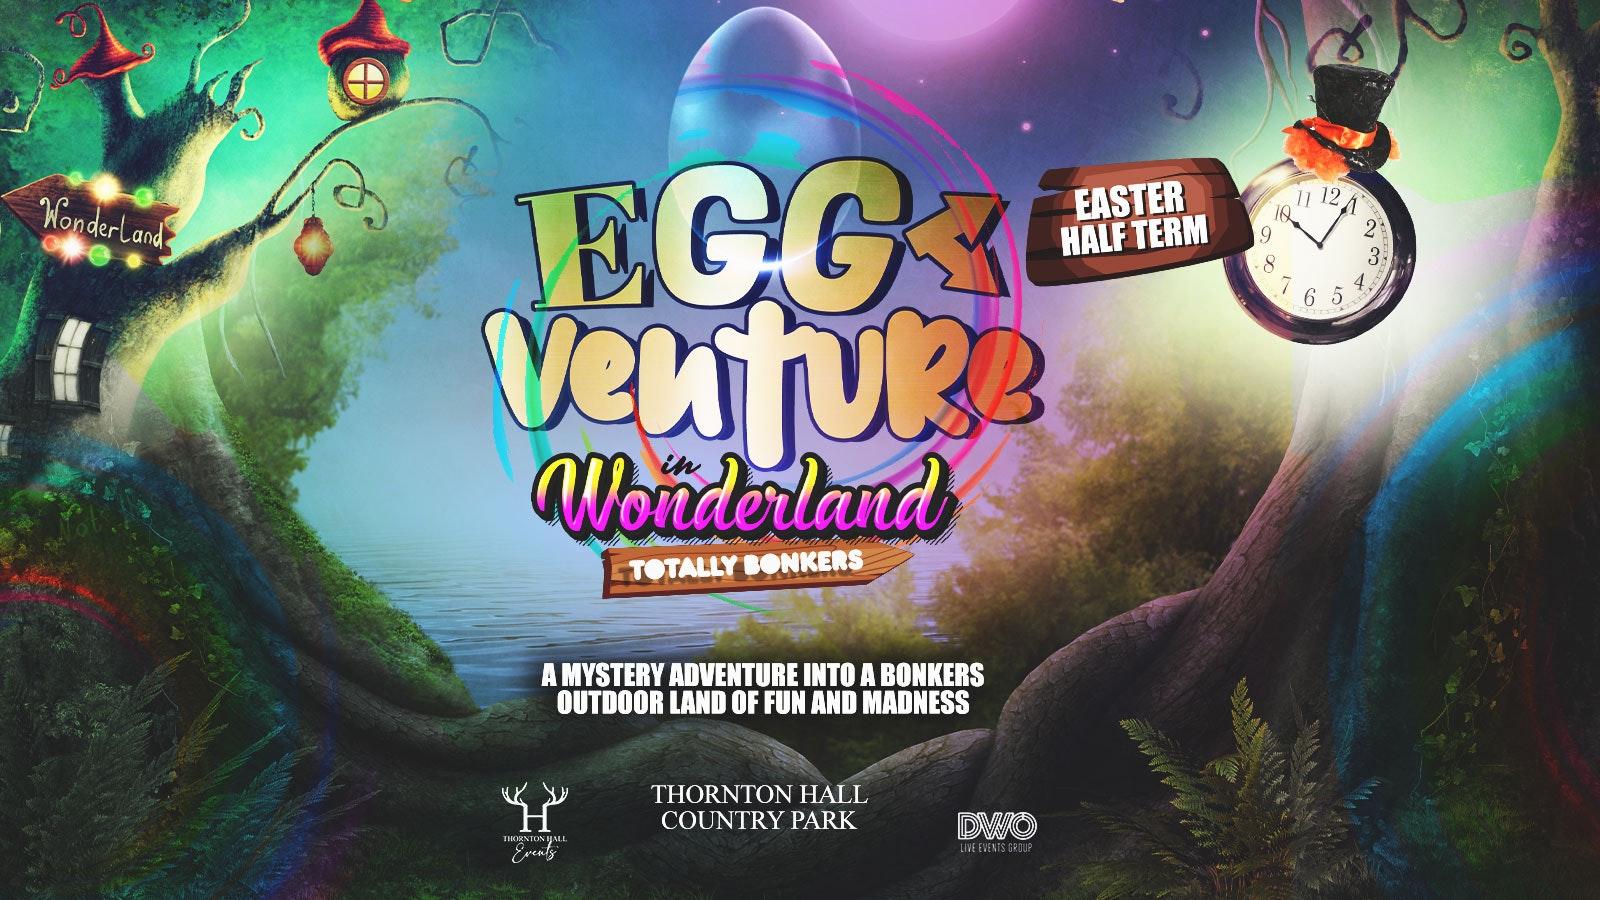 EggVenture in Wonderland – Sunday 11th April – 3pm